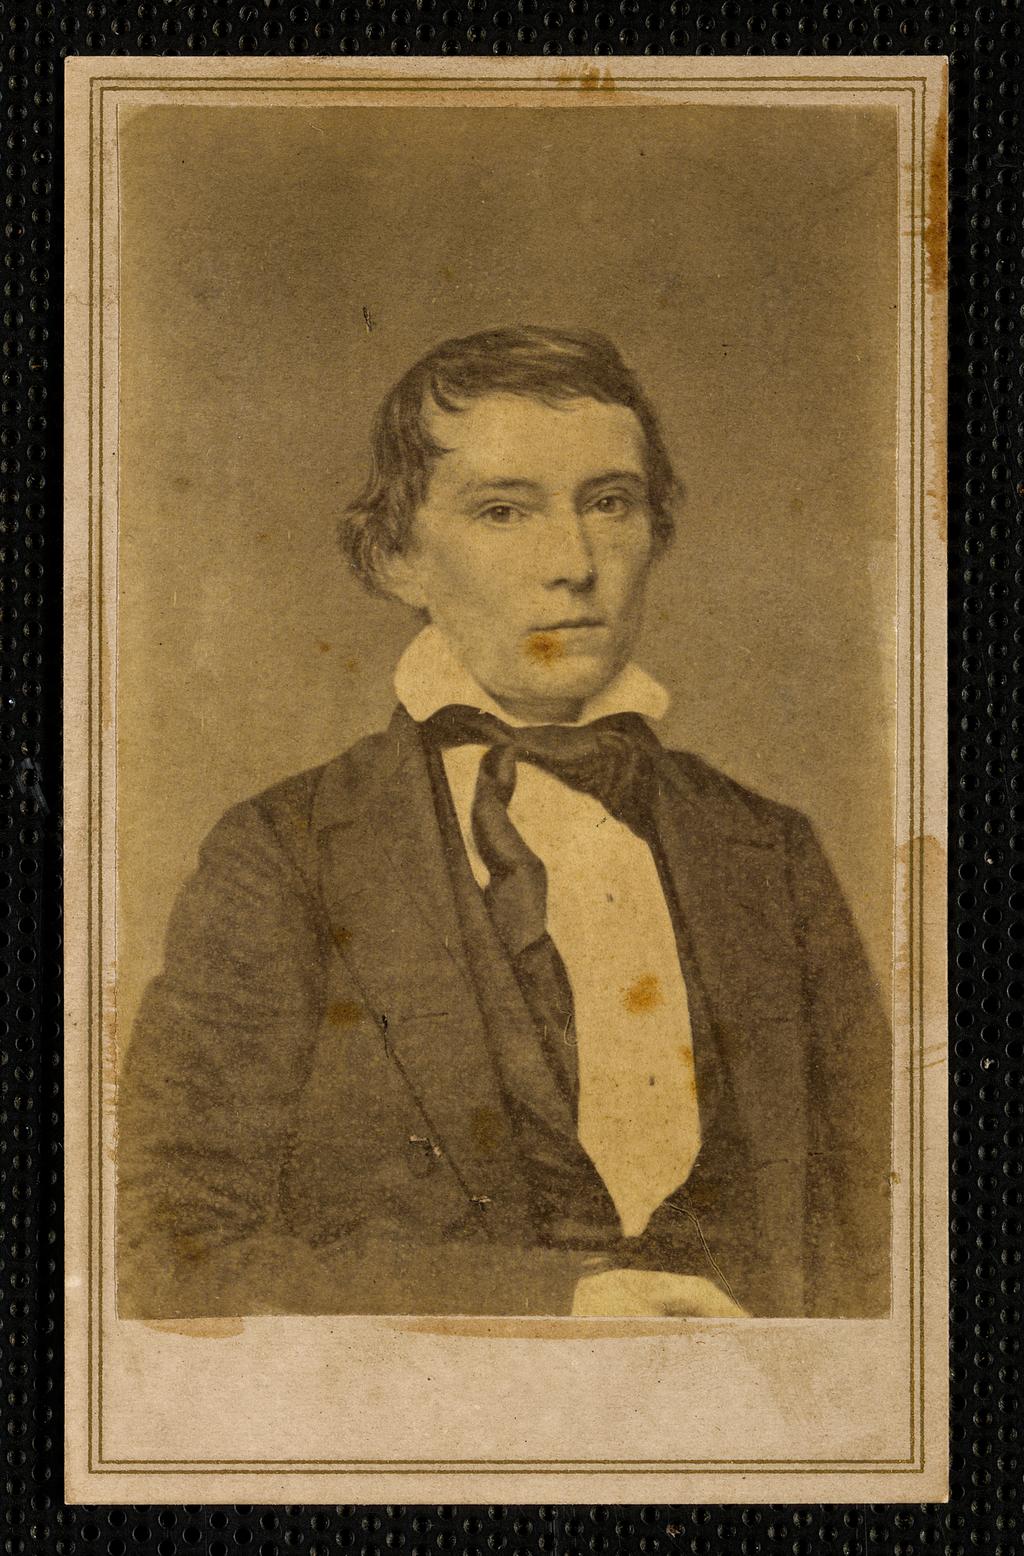 Вице-президент Конфедеративных Штатов Америки Александр Г. Стивенс